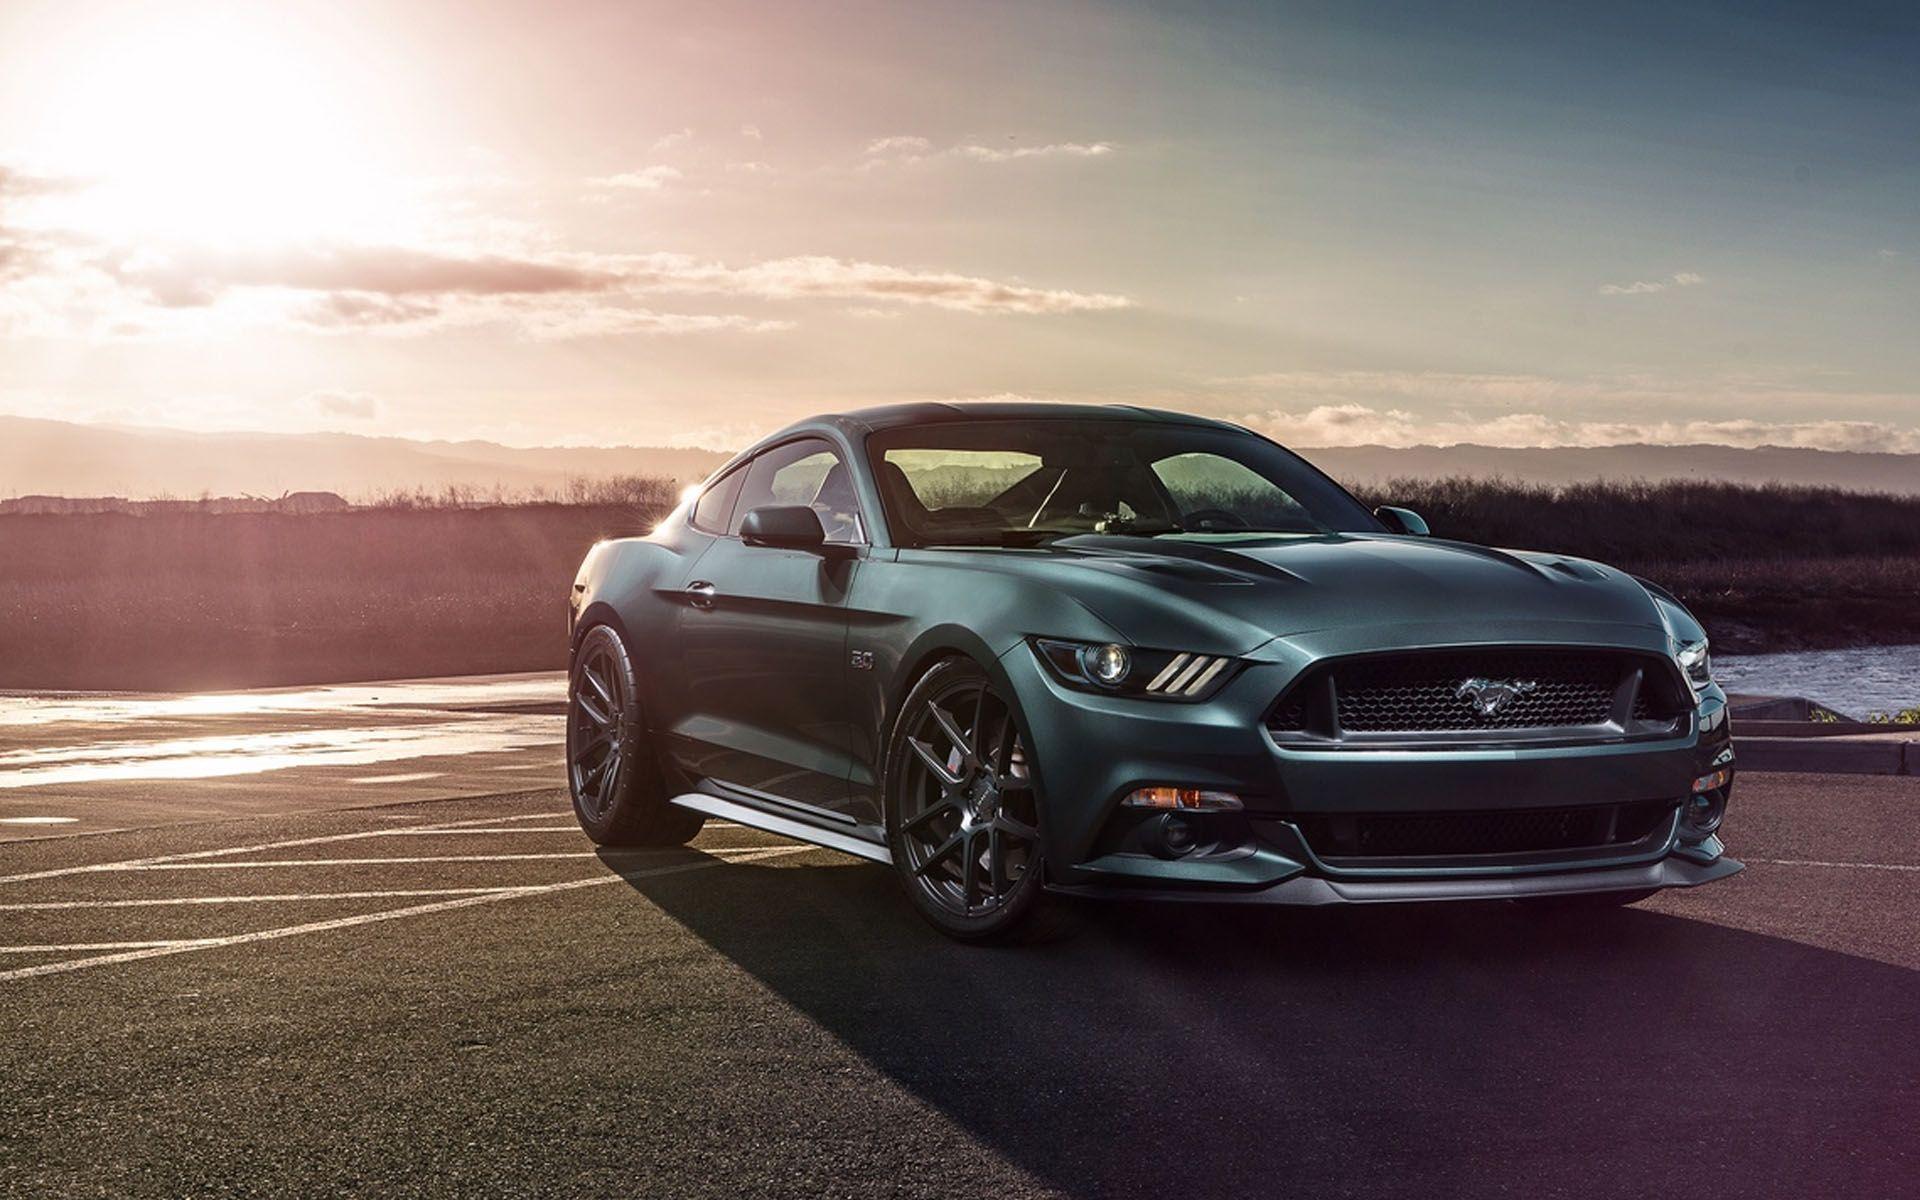 Ford Mustang 2018 Hd Wallpaper Mustang Gt Ford Mustang